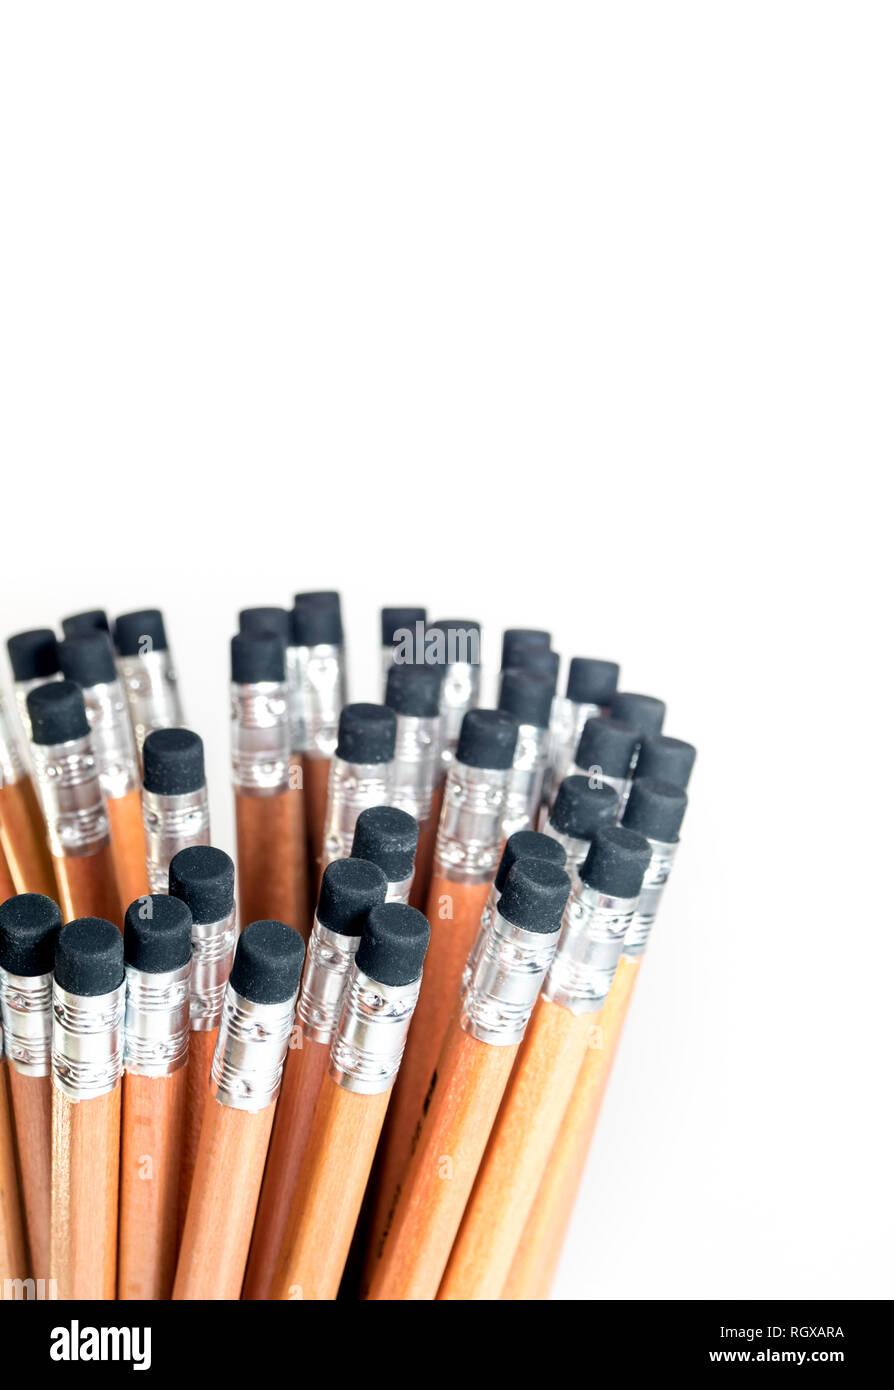 Radiergummi am Ende der Bleistift, Bleistift Stockbild